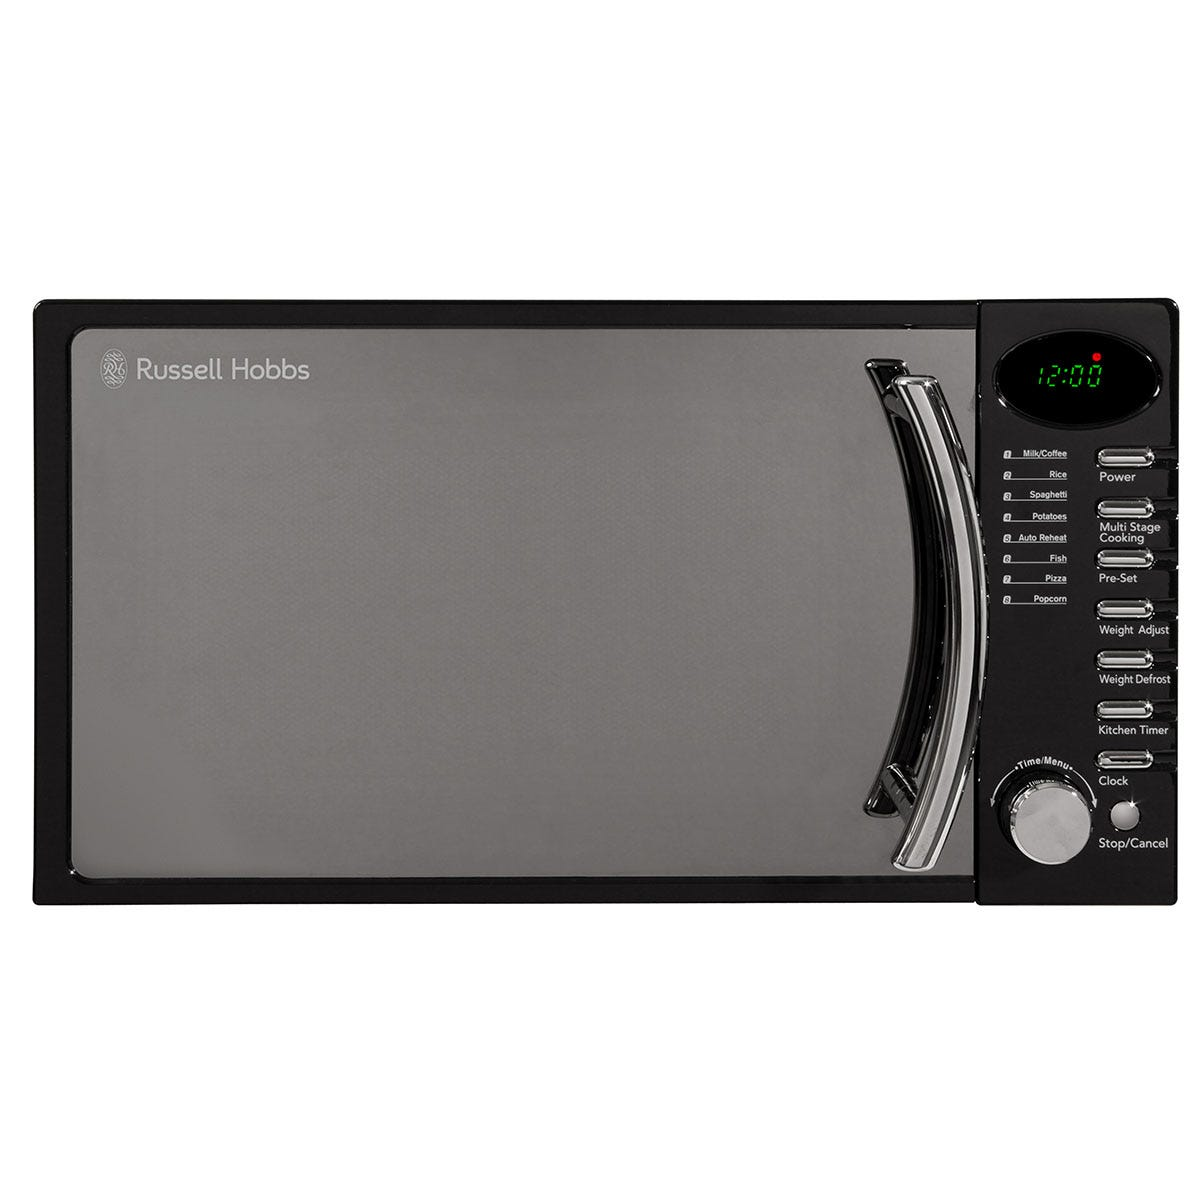 Russell Hobbs RHM1714BC 700W 17L Heritage Digital Solo Microwave - Black